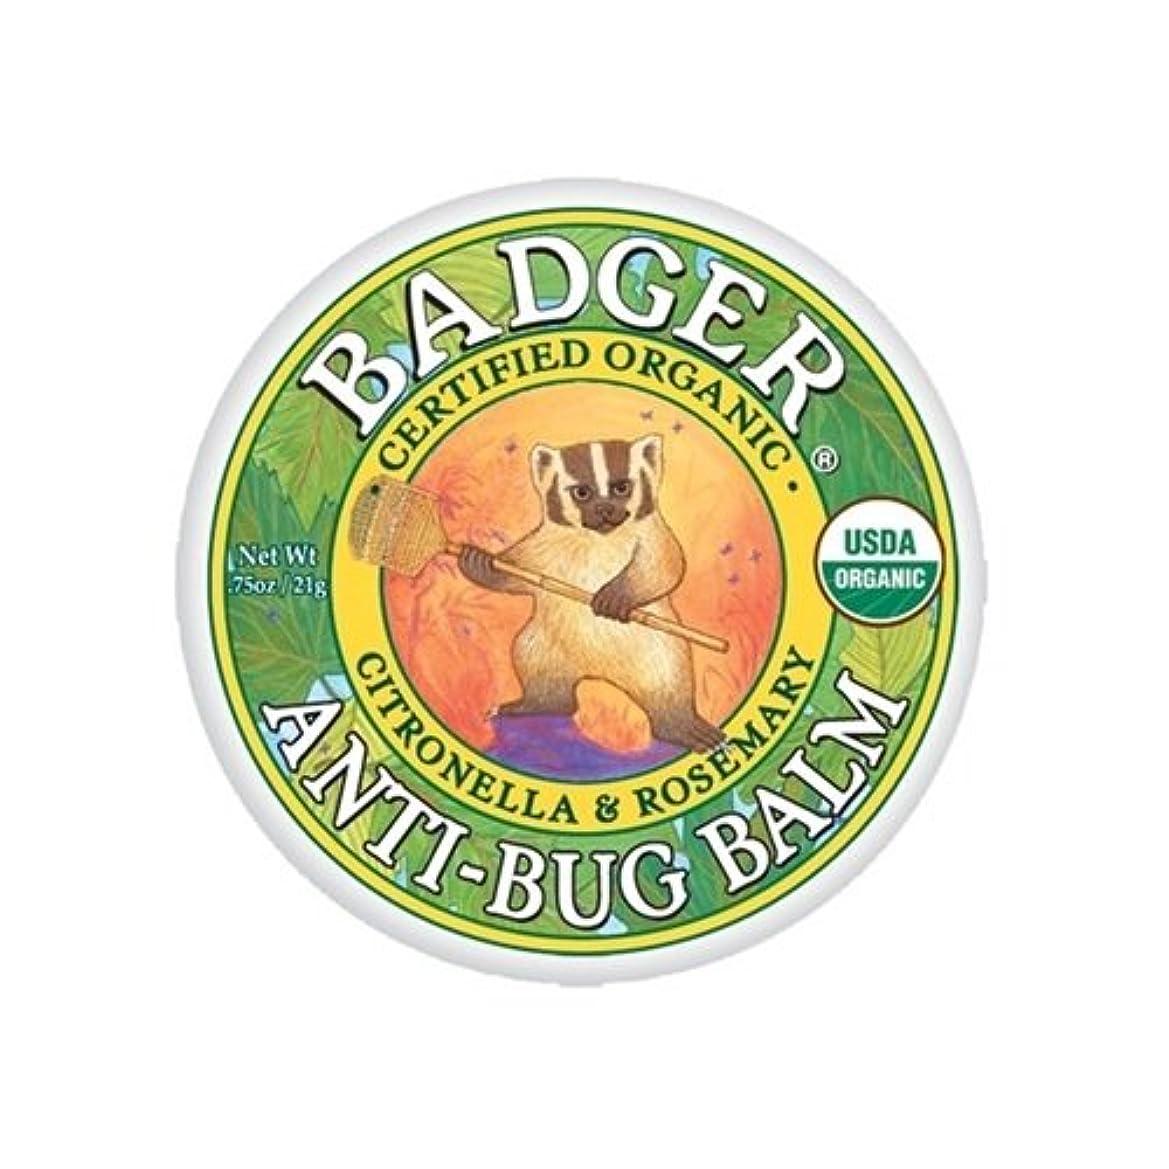 Badger バジャー オーガニック虫よけクリーム【小サイズ】 21g【海外直送品】【並行輸入品】